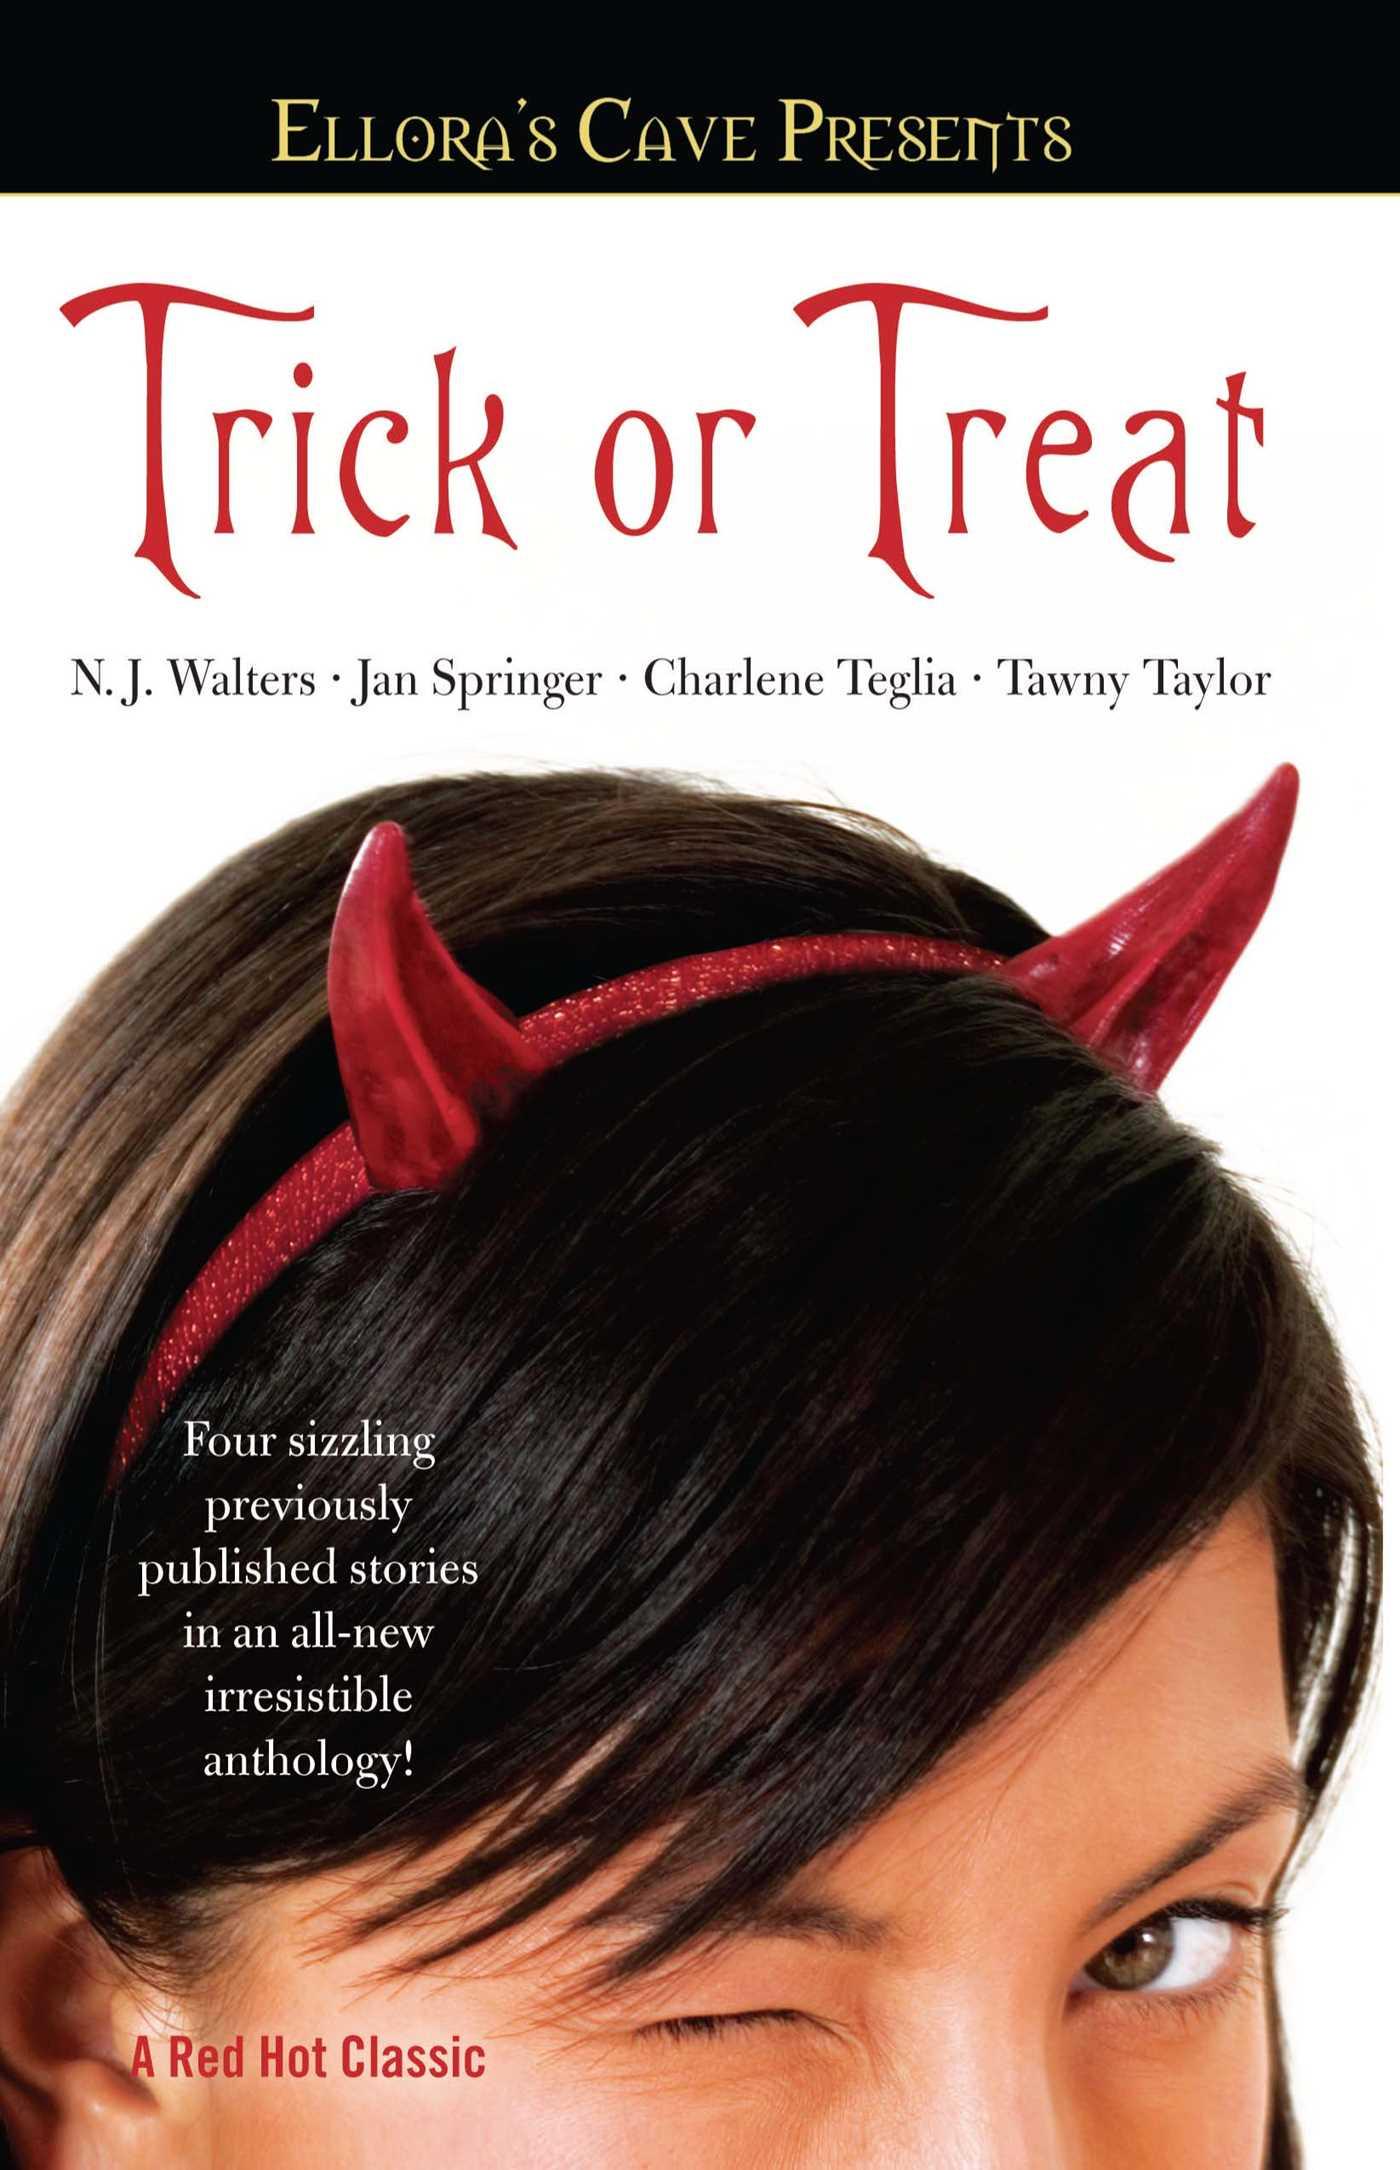 Trick or treat 9781439131558 hr